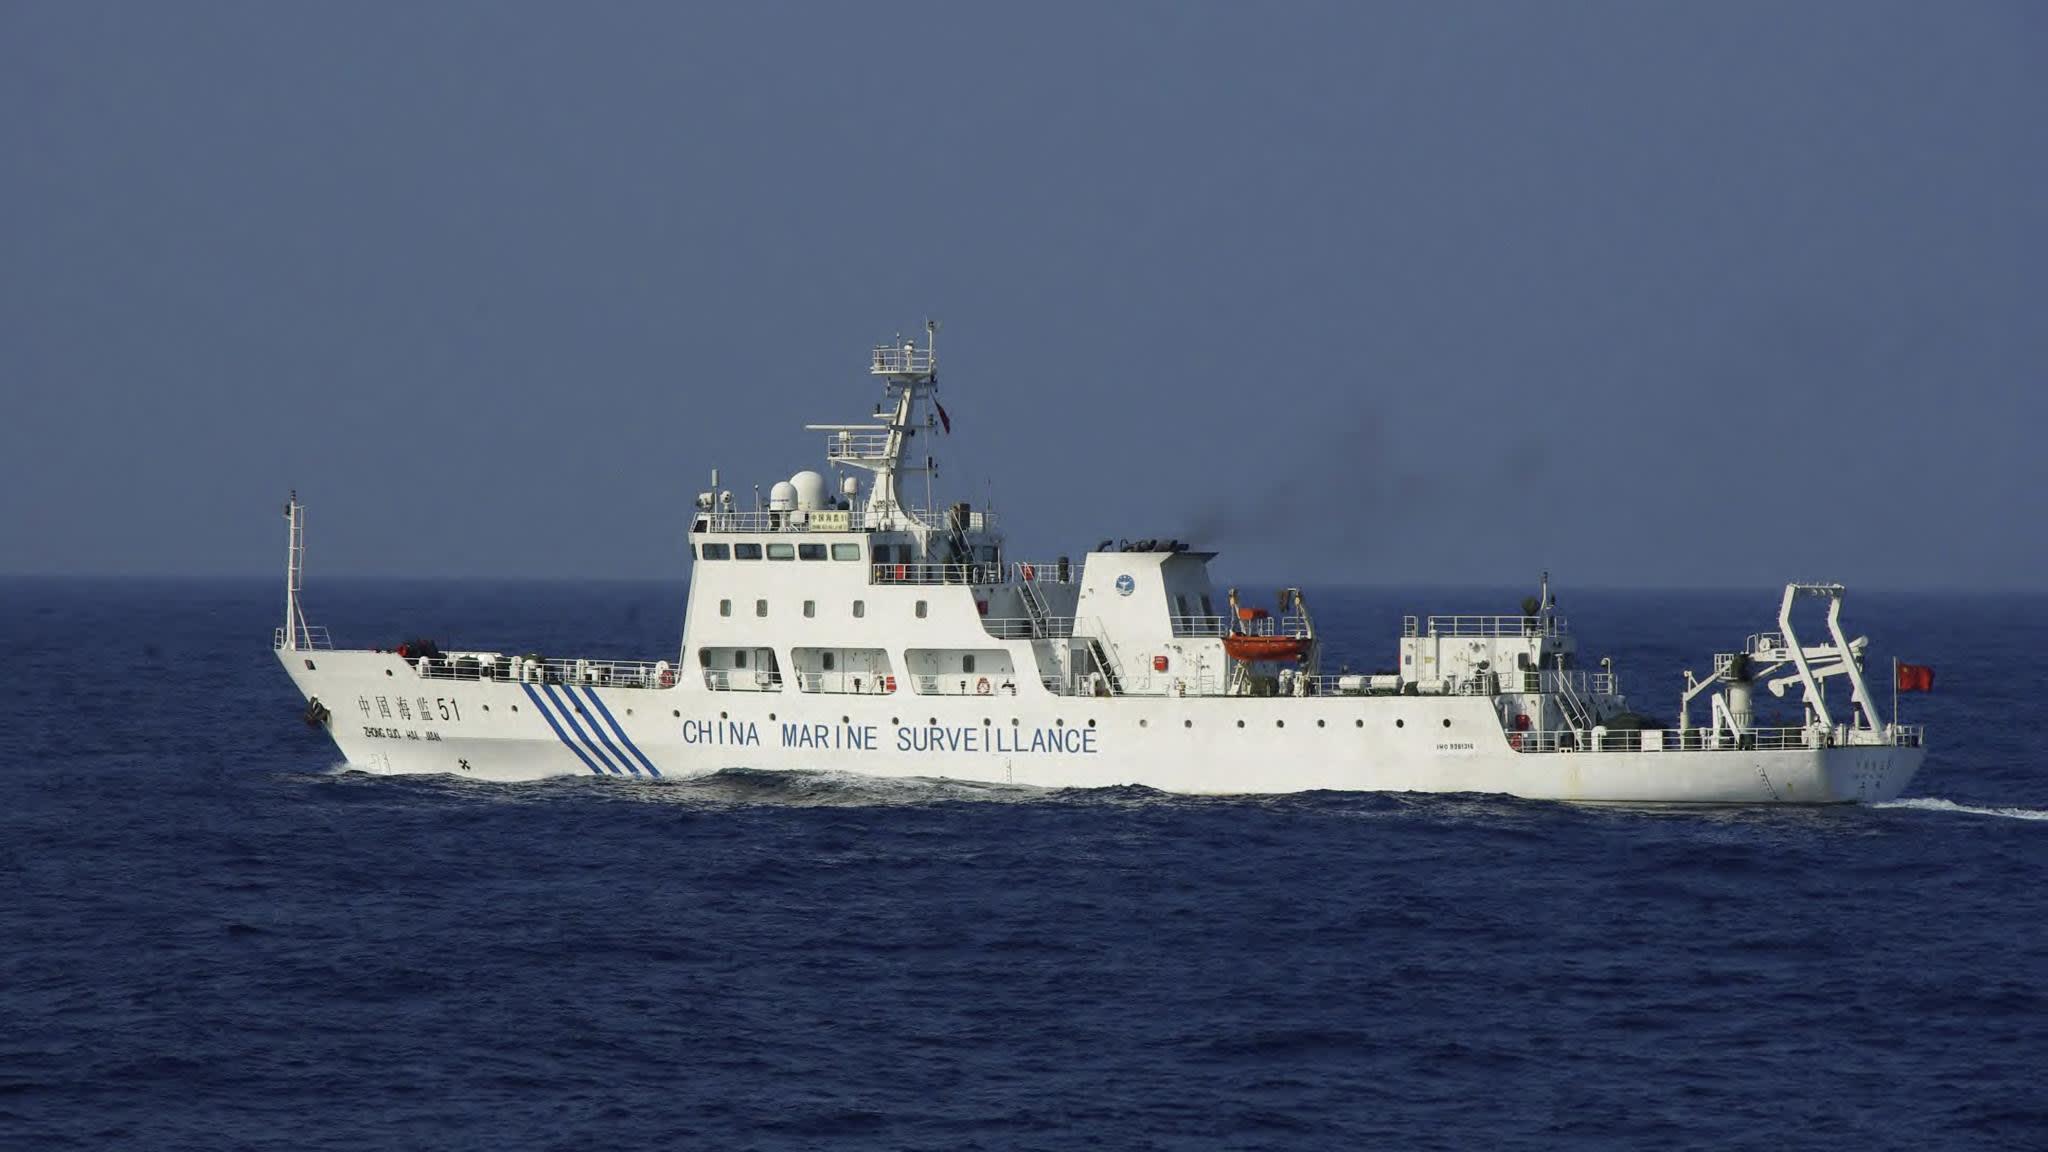 China training for 'short, sharp war', says senior US naval officer | Financial Times